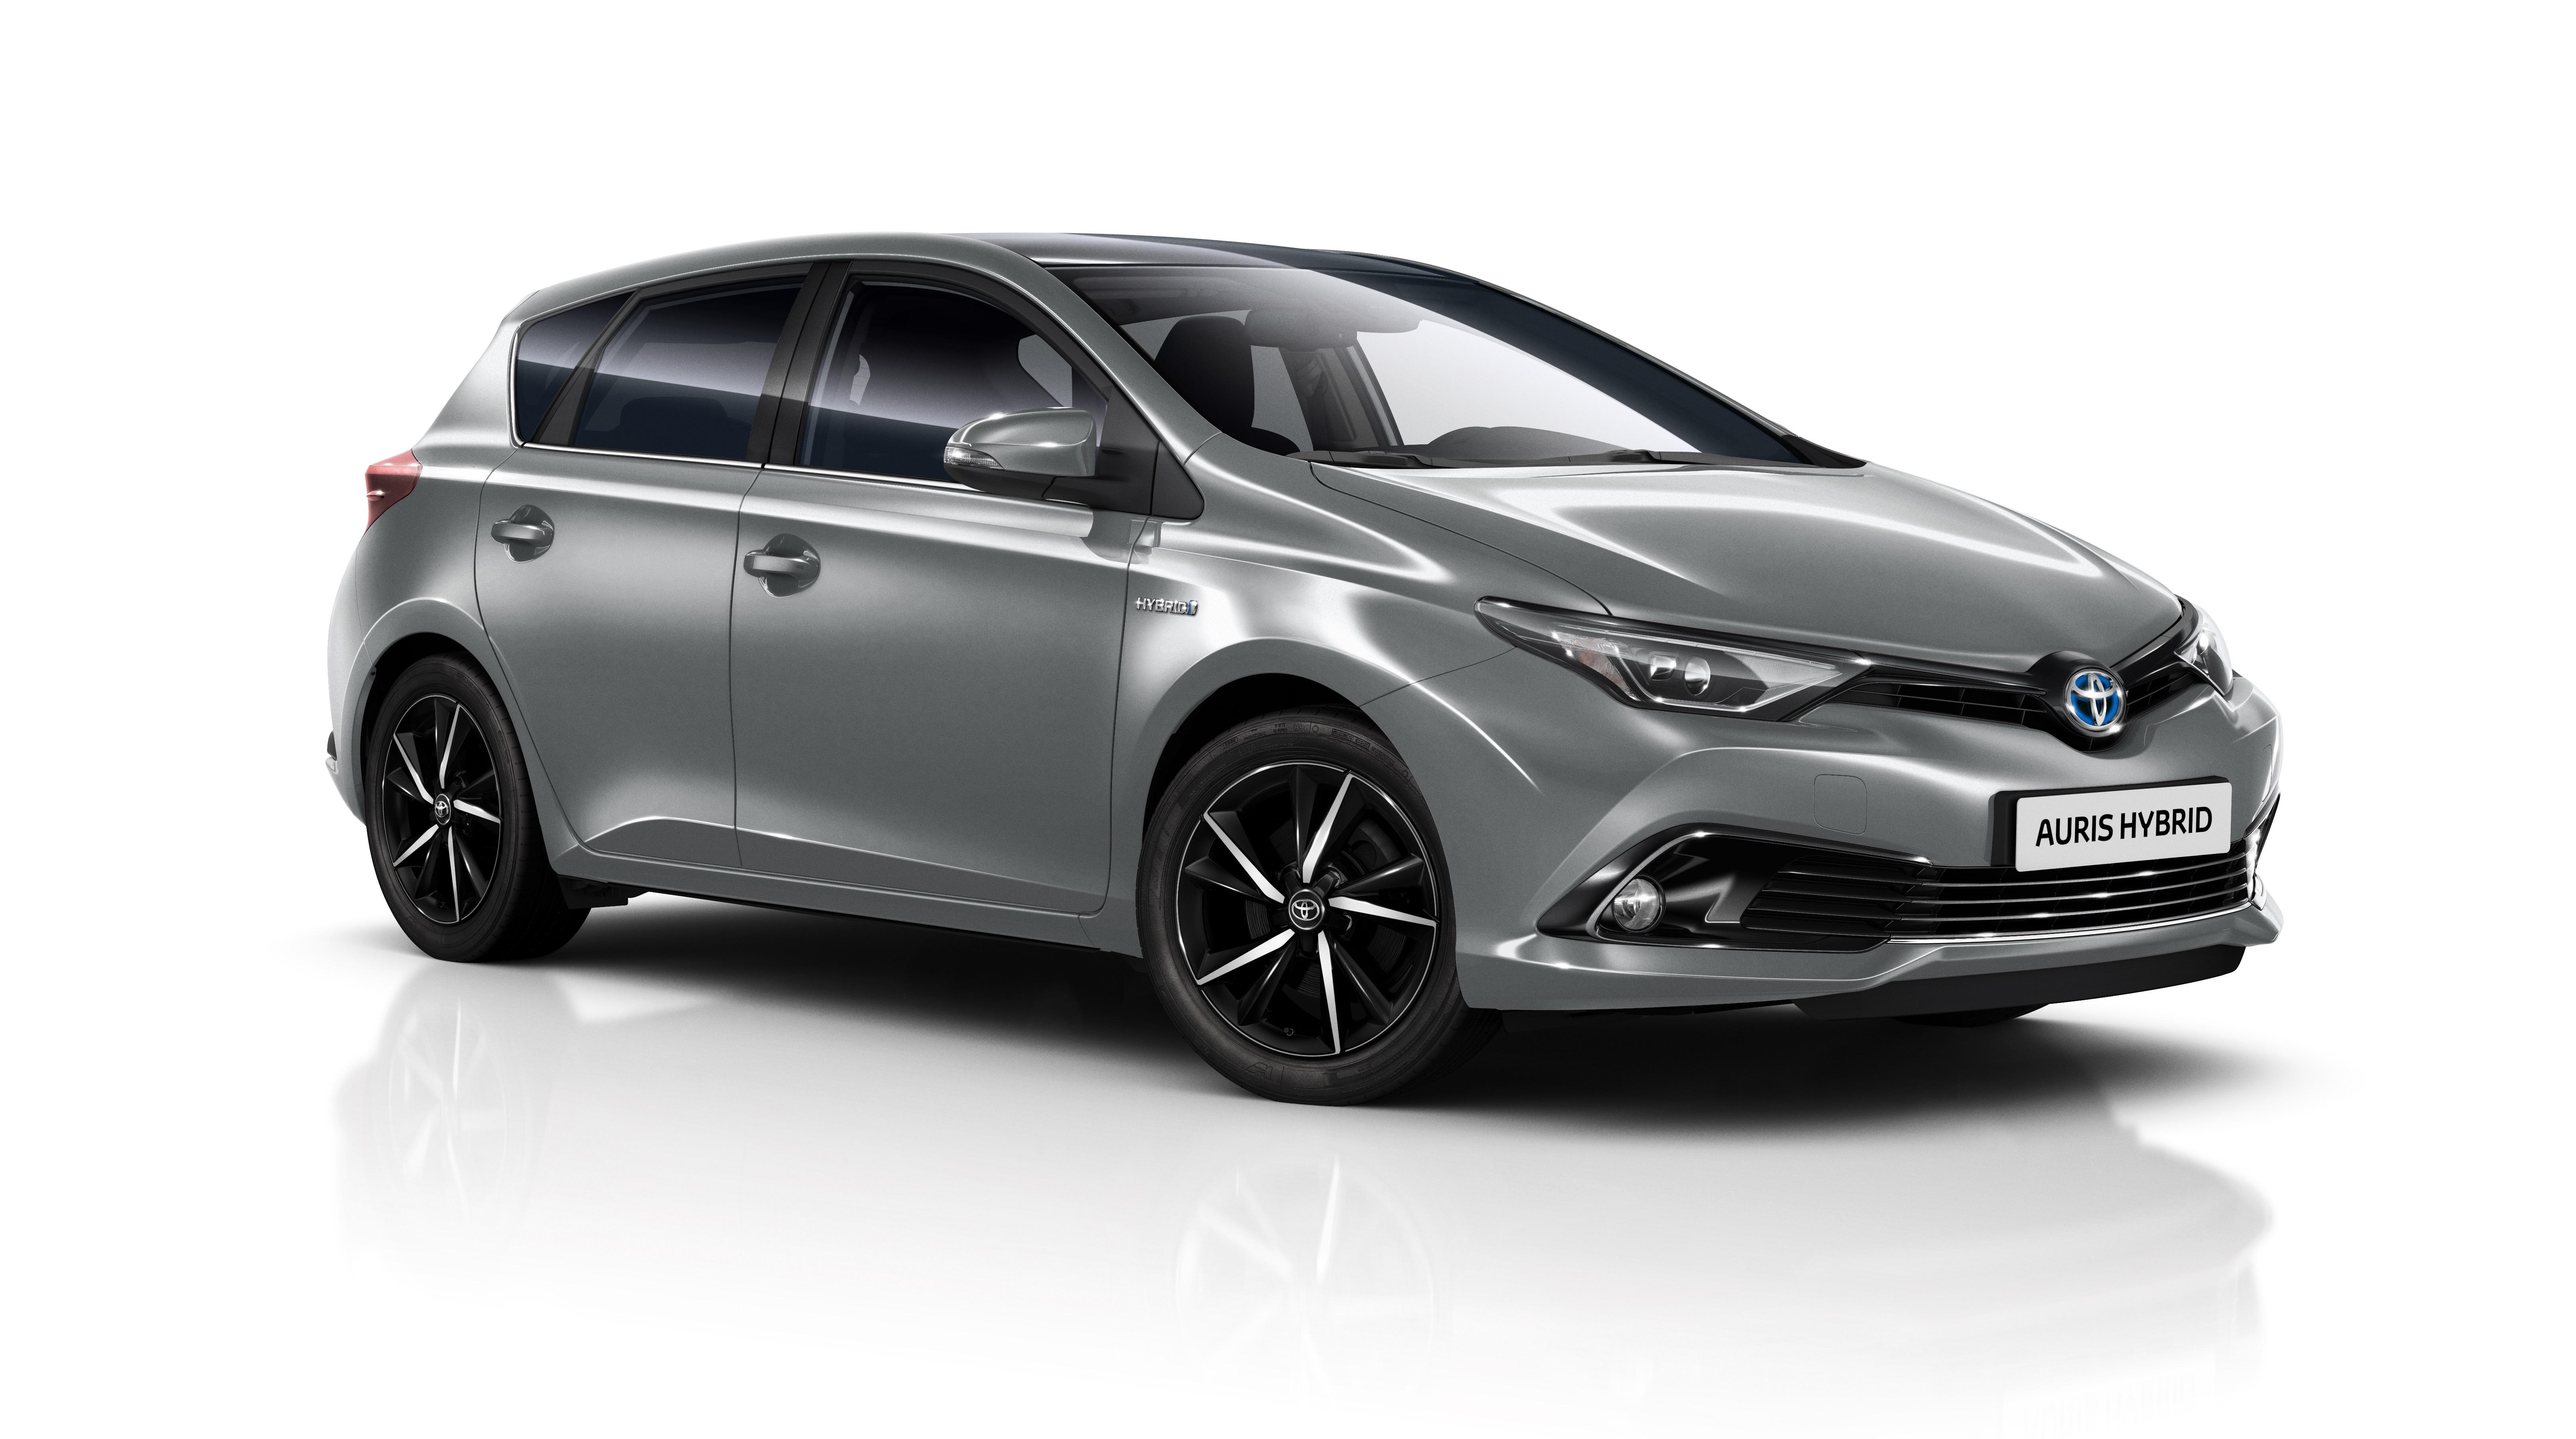 Nuevo Toyota Auris 2018 Desde 16 450 Euros Revista De Coches